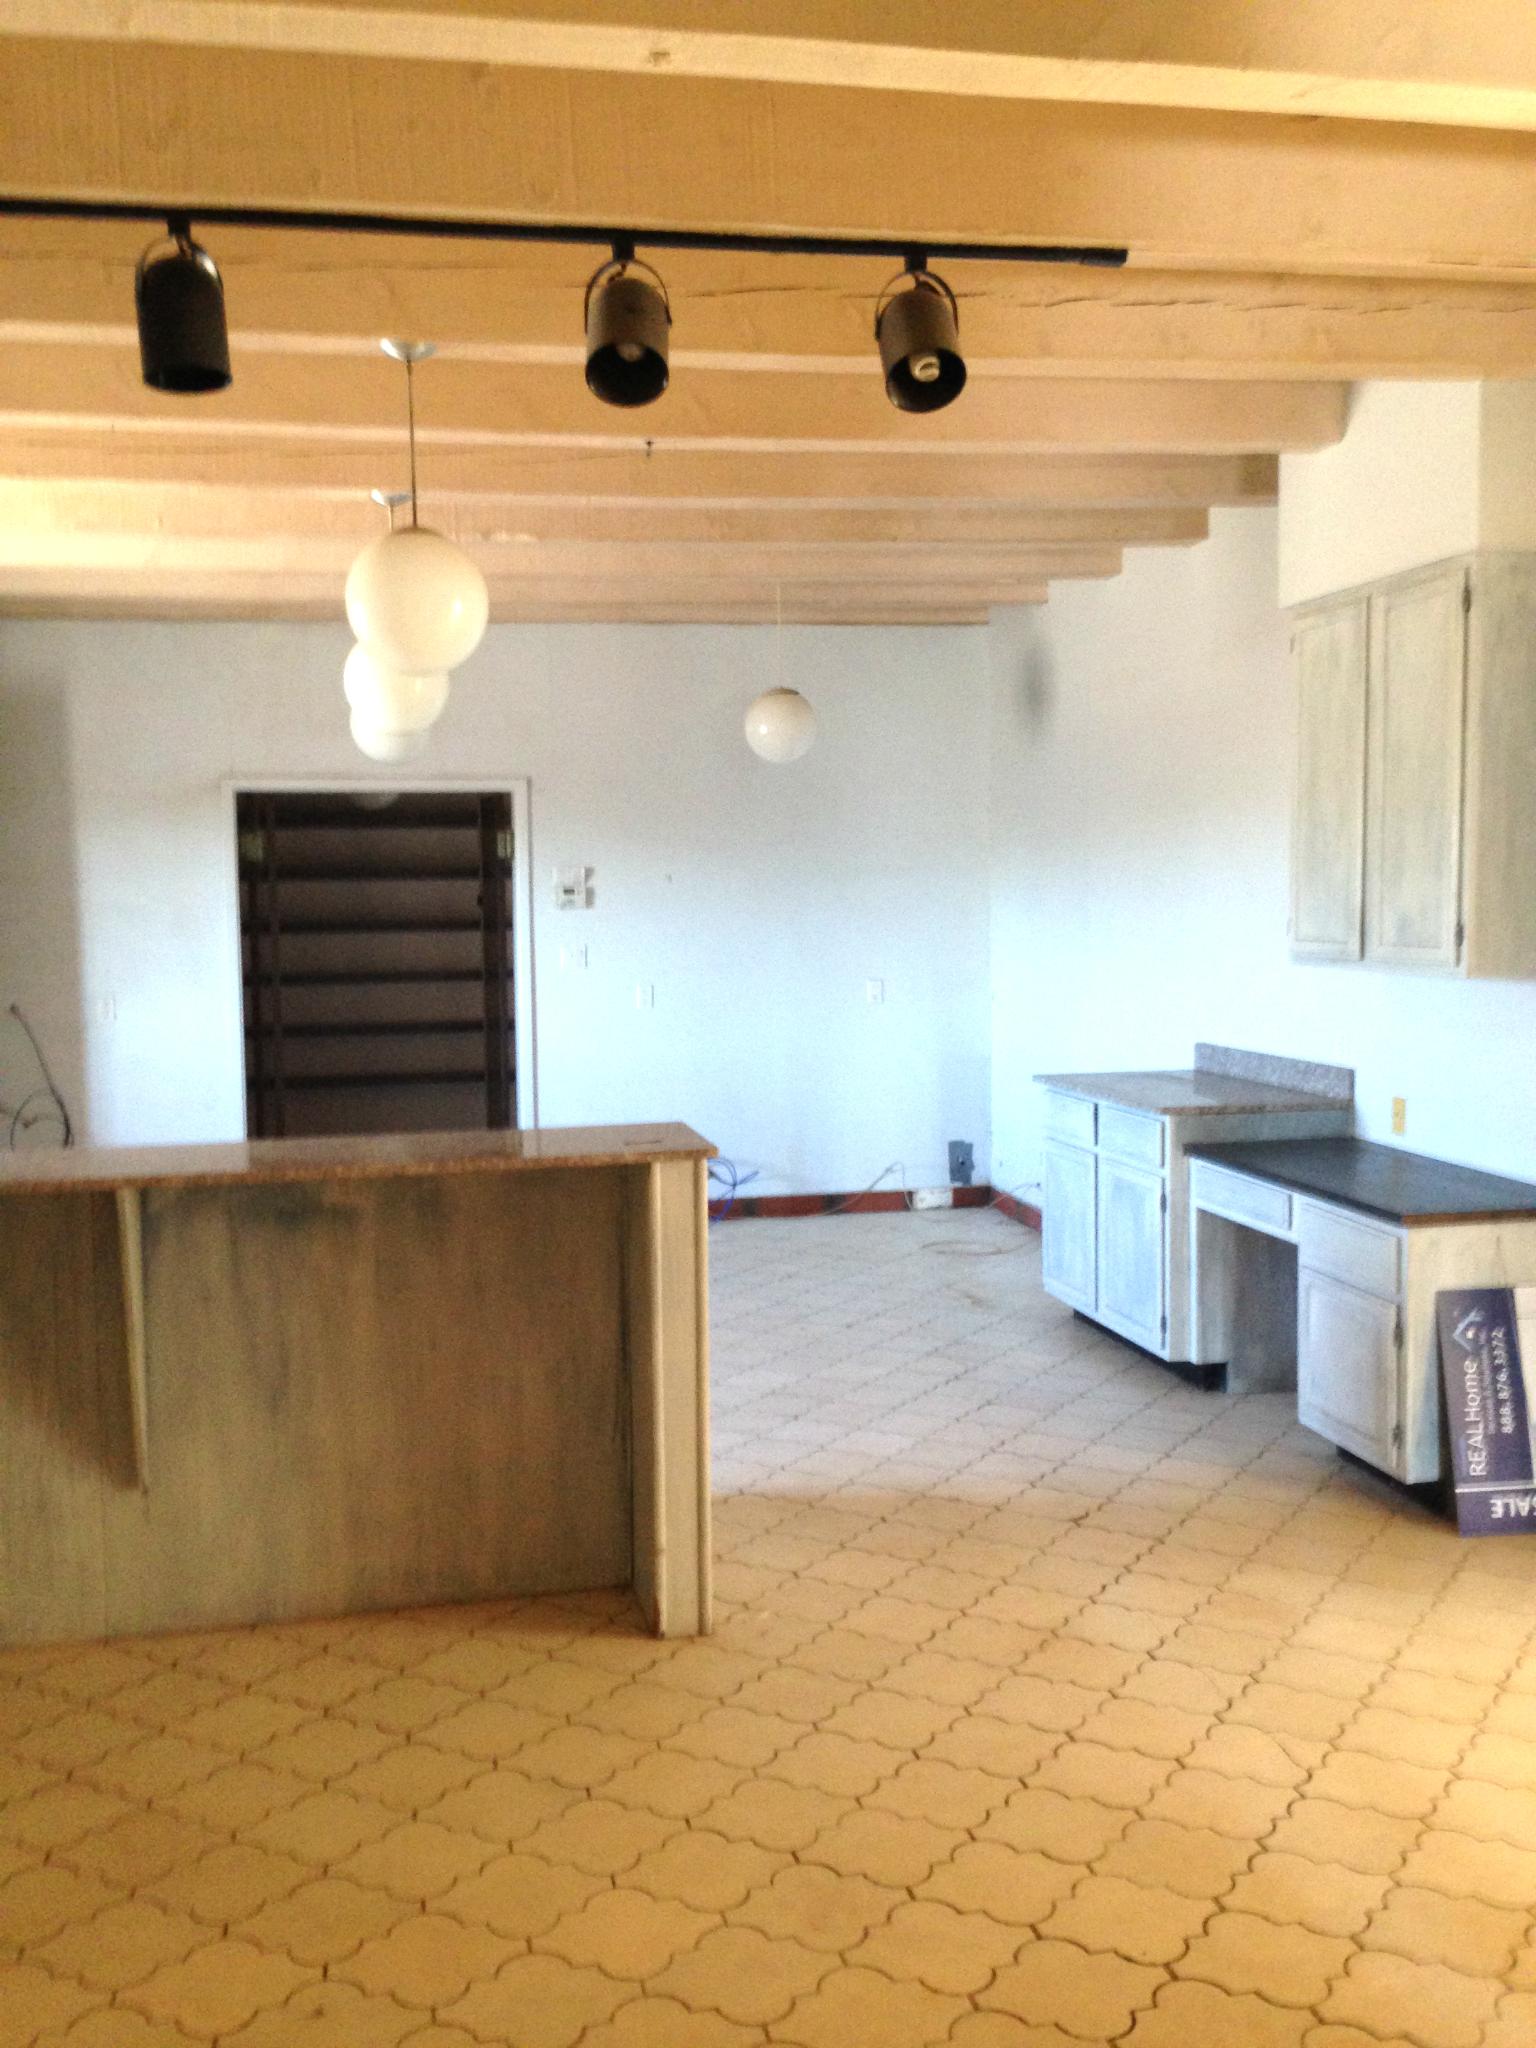 A New Mexico Farmhouse Entryway: Before the Renovation